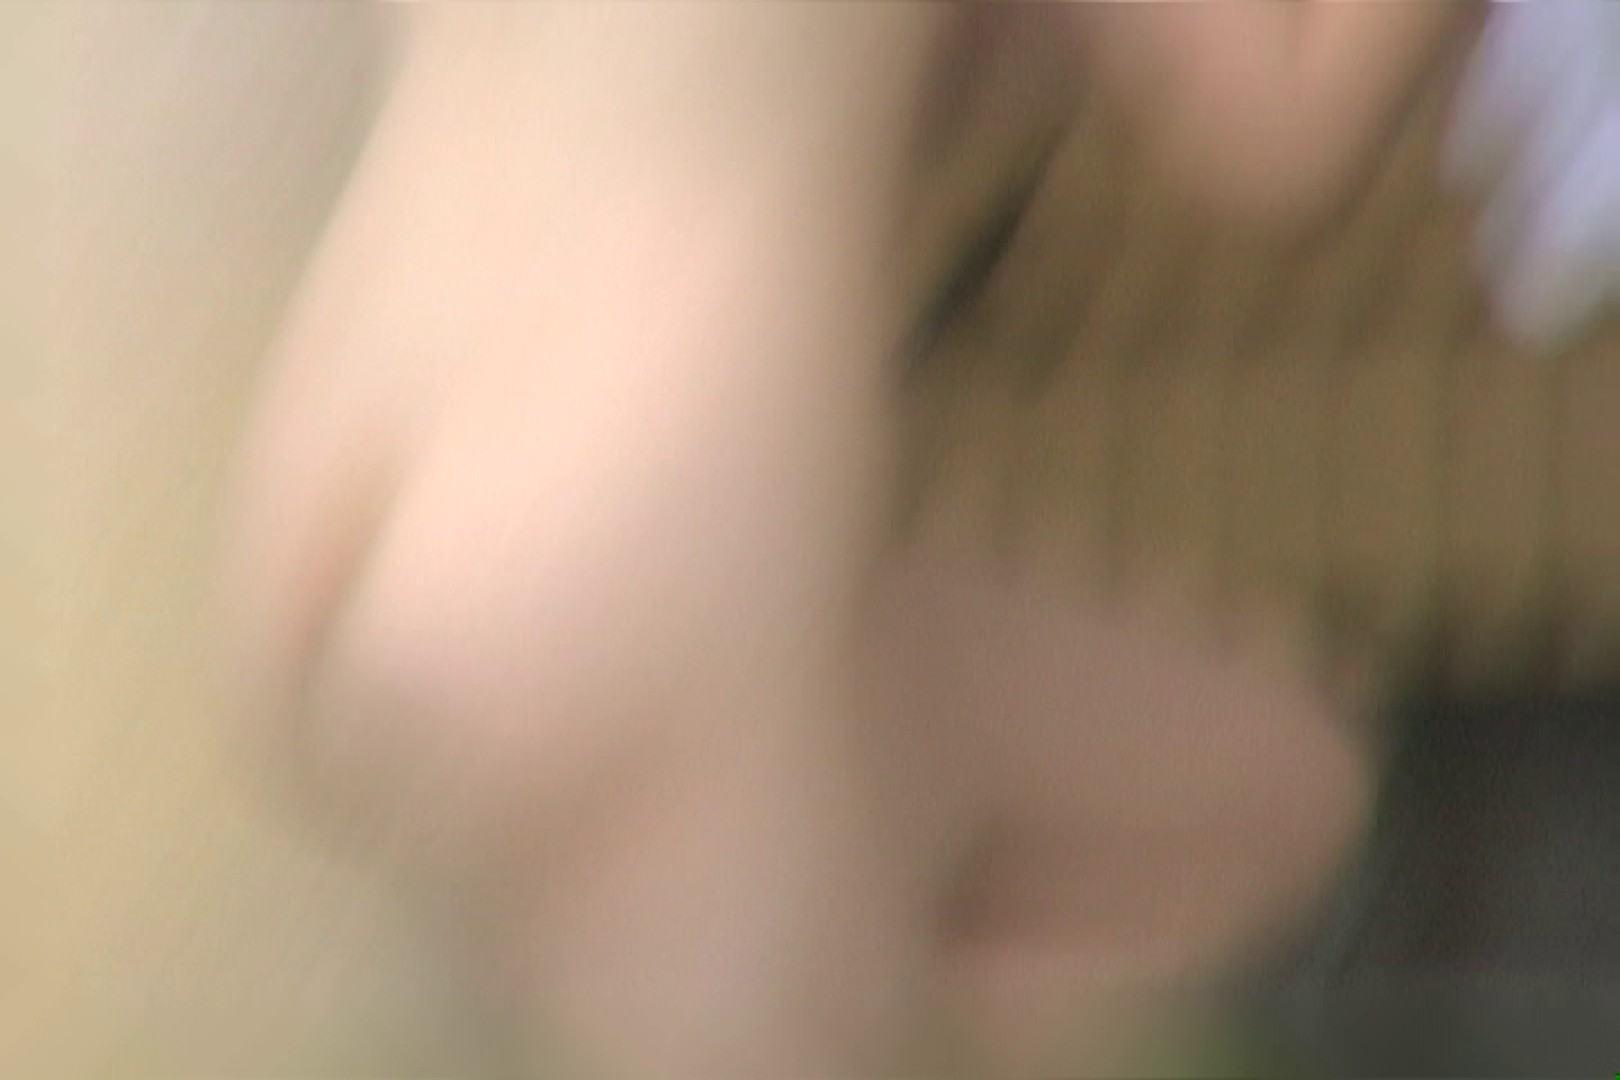 Aquaな露天風呂Vol.579 盗撮 隠し撮りオマンコ動画紹介 42PICs 11